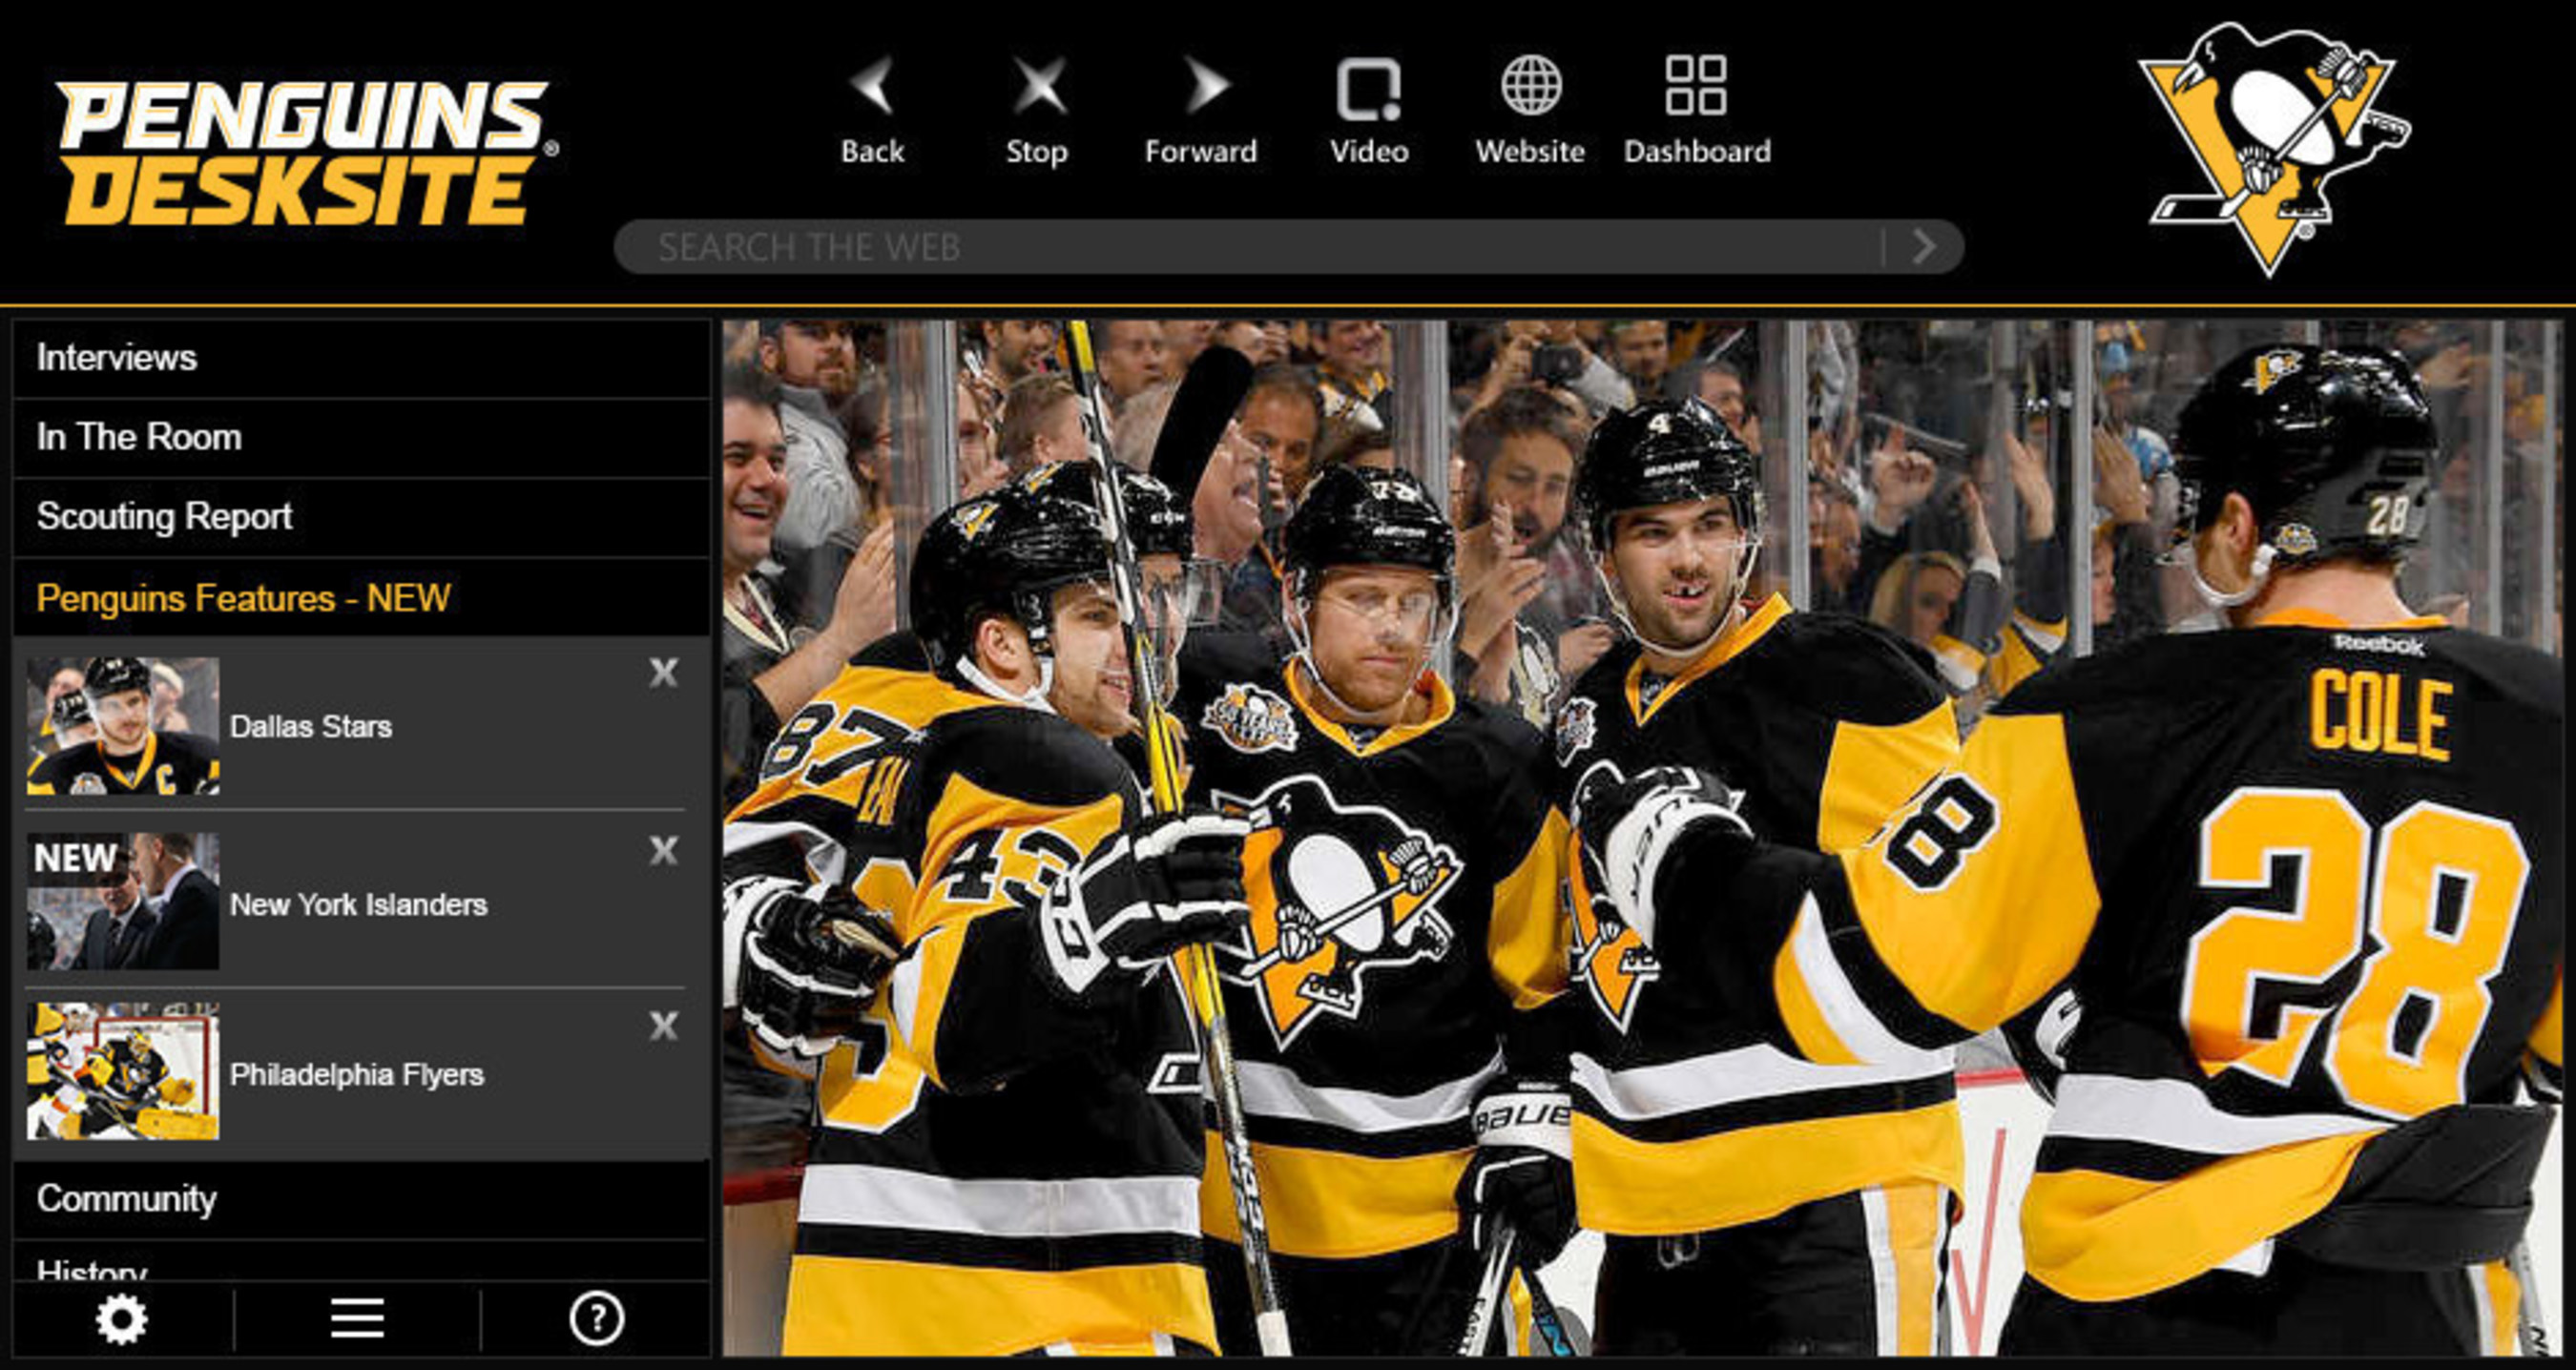 Pittsburgh Penguins launch new video app with Penguins DeskSite.